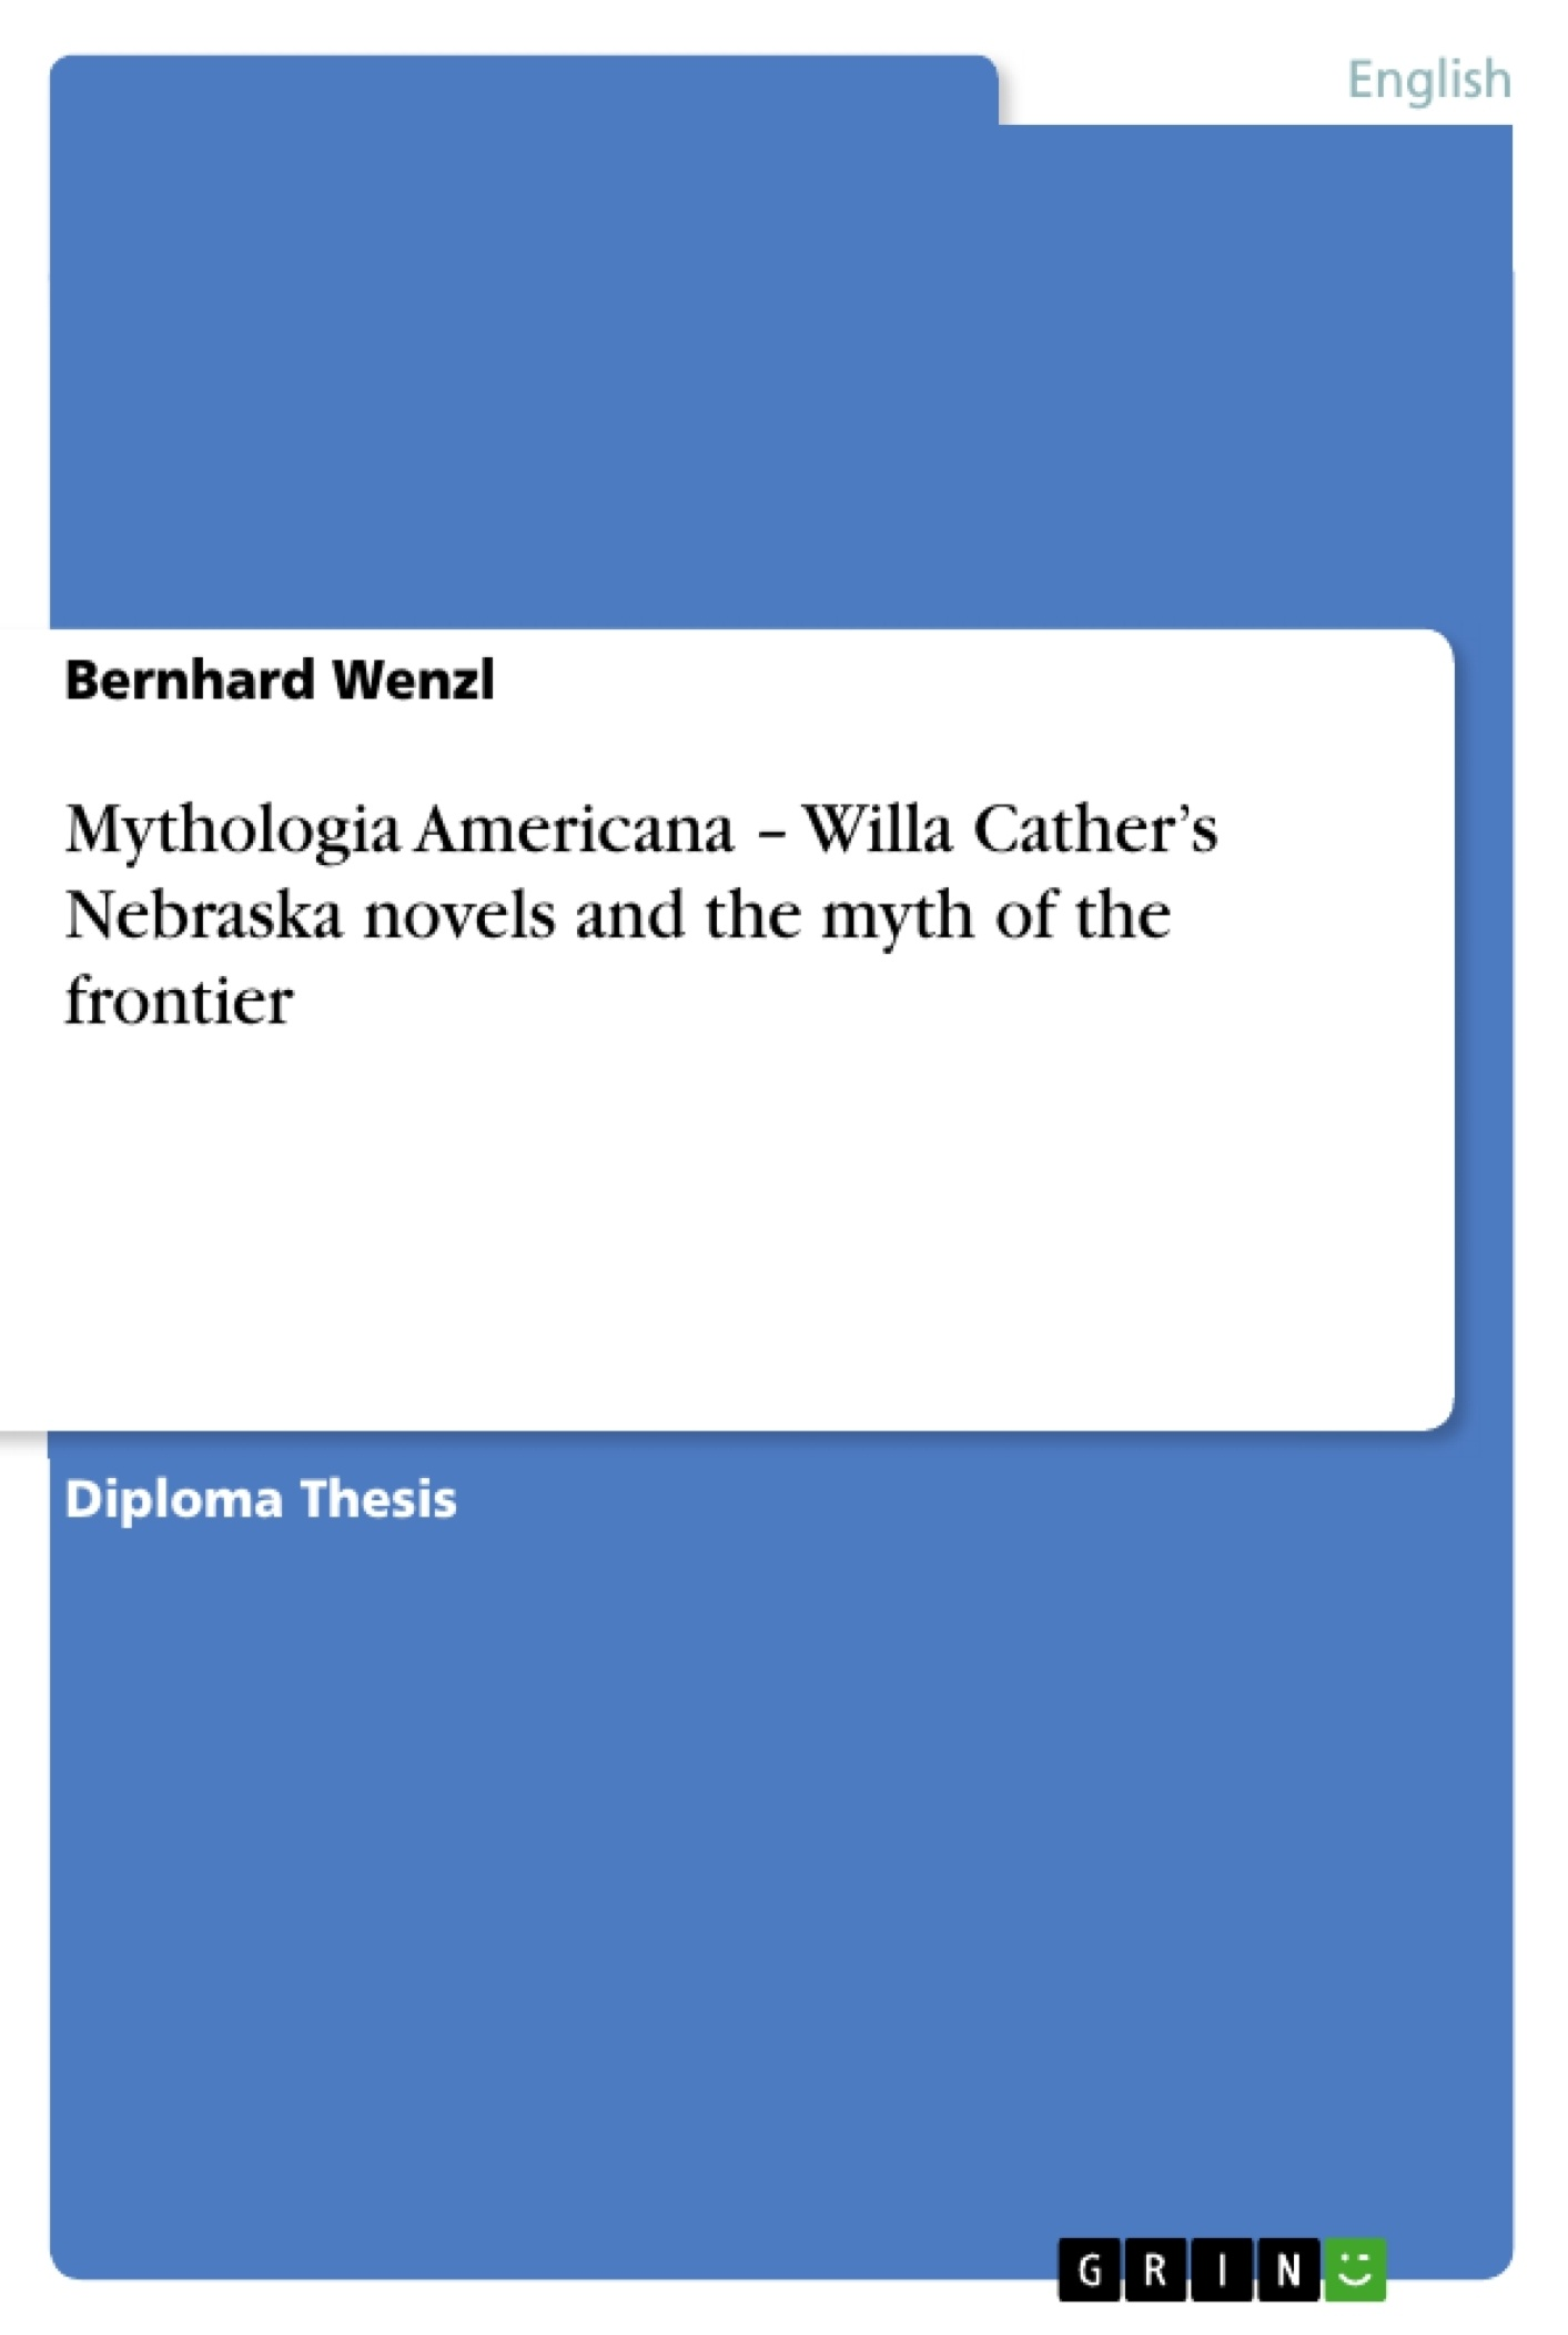 Title: Mythologia Americana – Willa Cather's Nebraska novels and the myth of the frontier